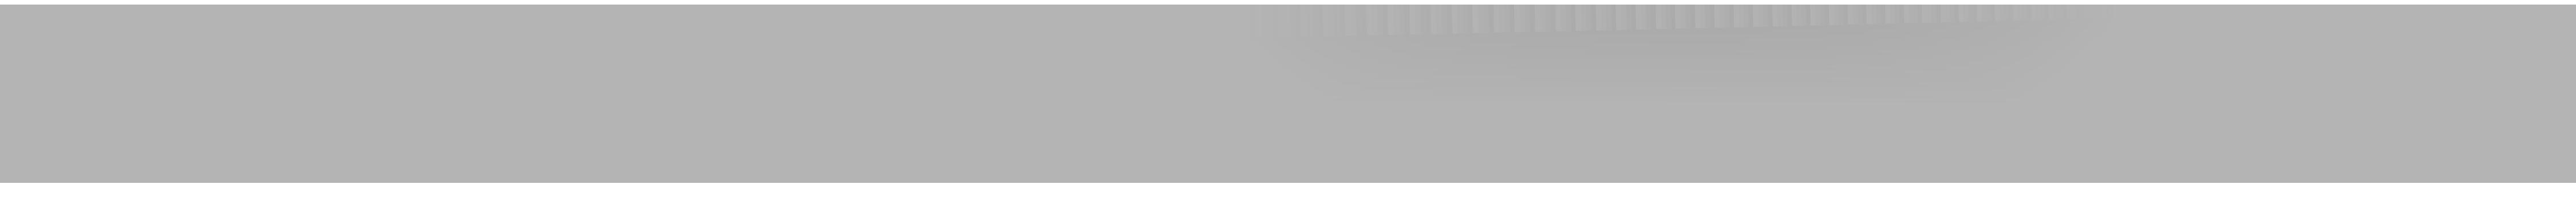 Schatten_024